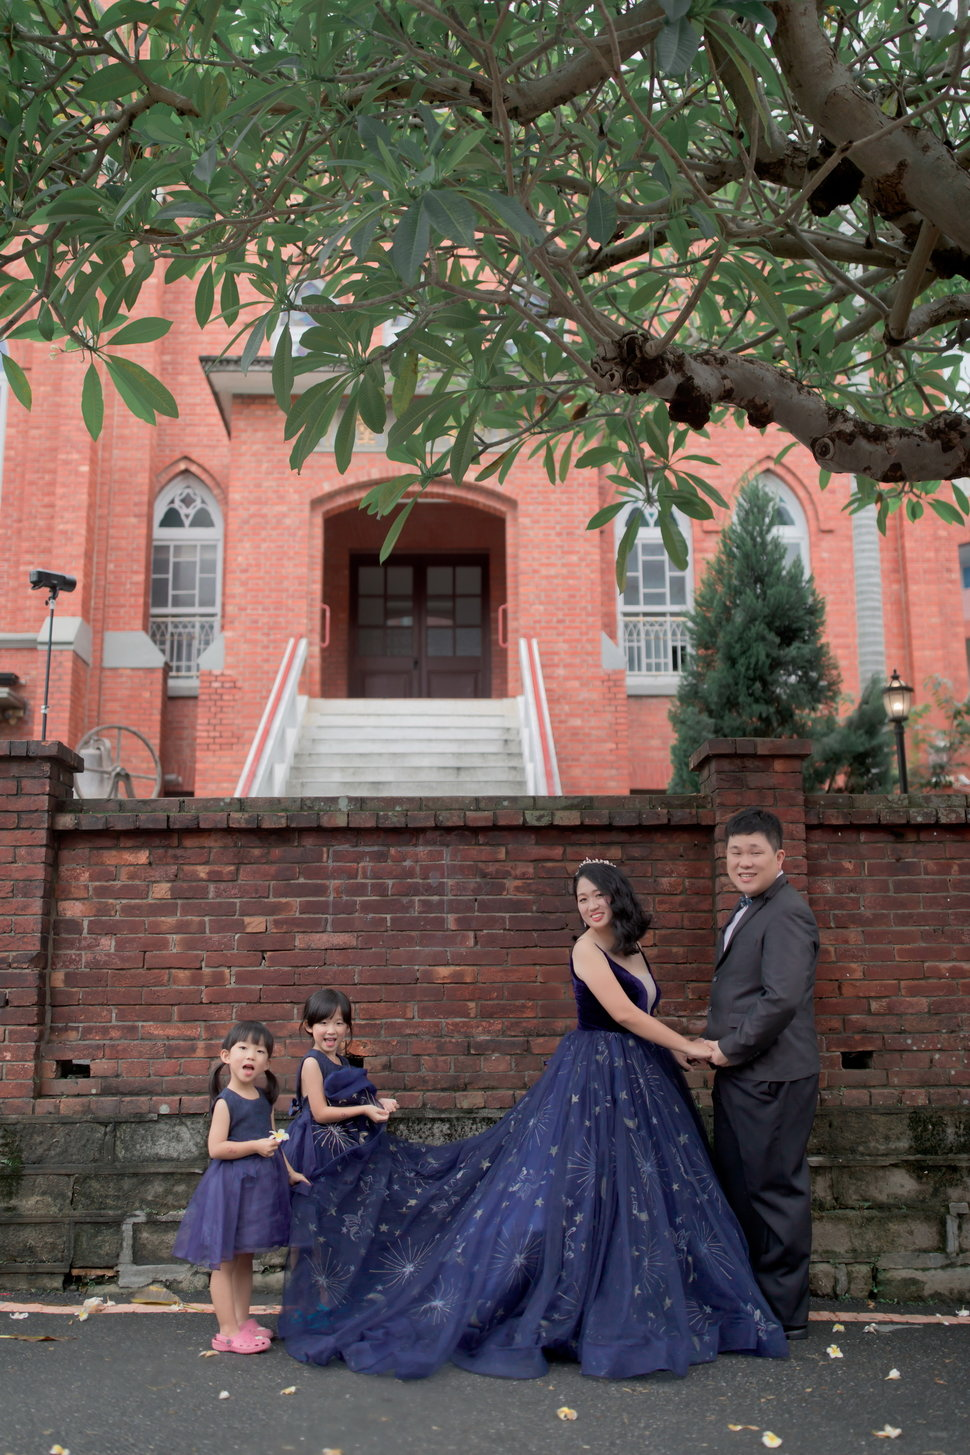 PP_0257_調整大小 - 巴黎婚紗攝影台灣總店《結婚吧》